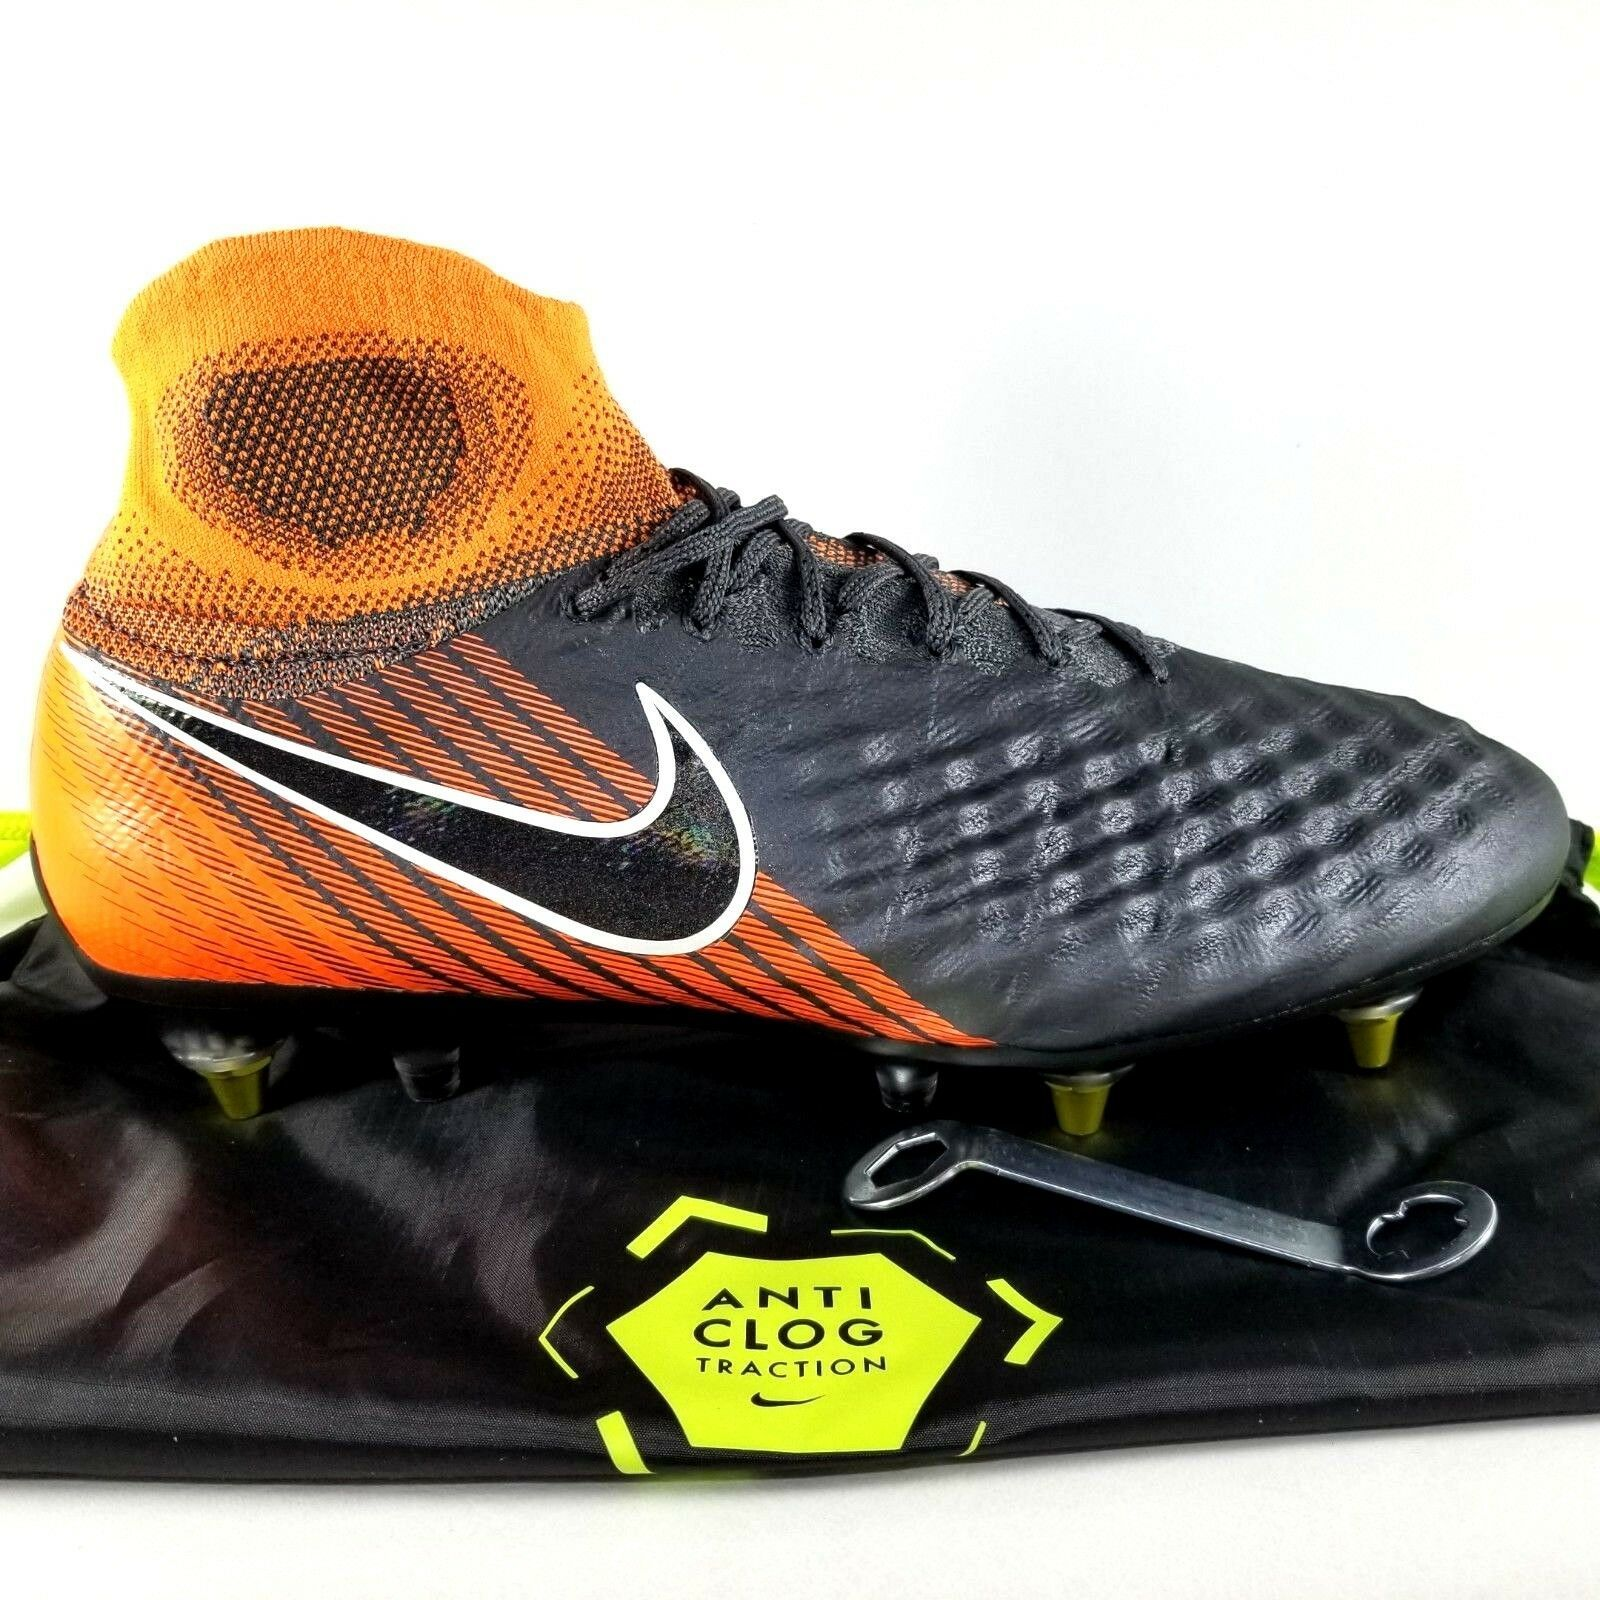 fc0e2852cec0 57. 57. Previous. Nike Magista Obra 2 Elite DF SG Pro Soccer Cleats SZ 10.5 Mens  Boot Orange Black